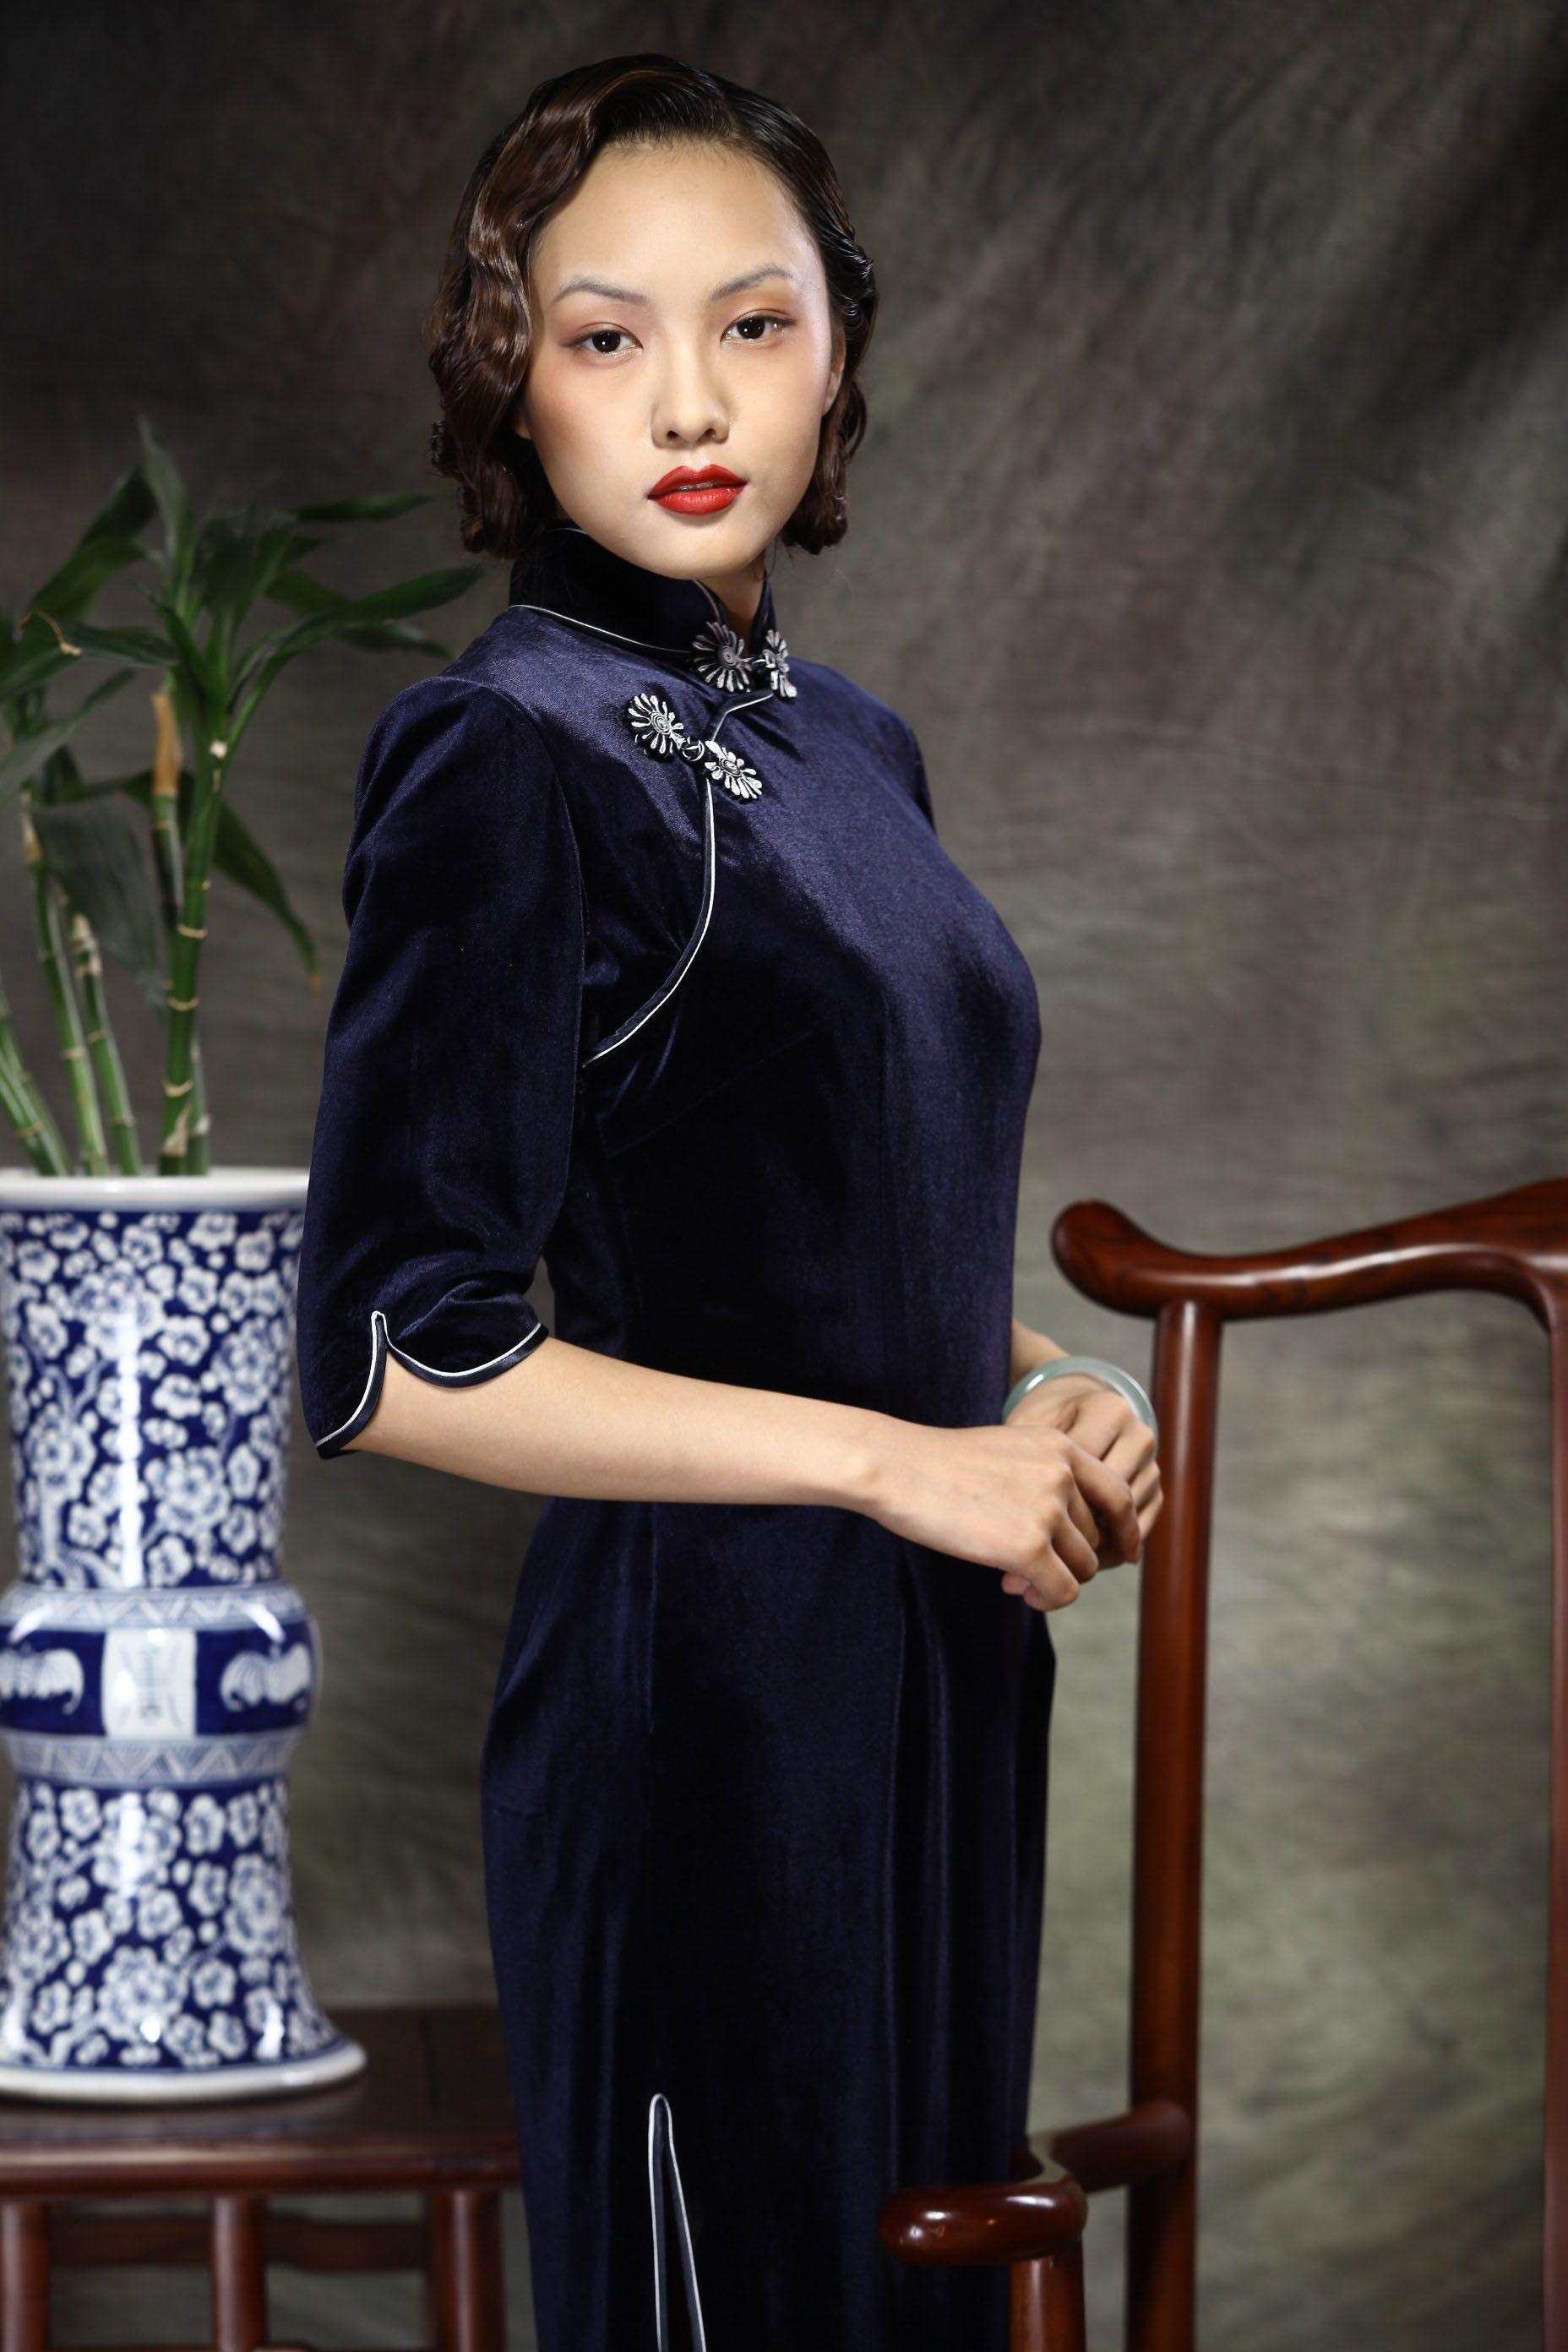 Chinese Haute Couture Long Style Cheongsam Gowns Dark Blue - $242 - SKU: 037622 - Custom Now: http://elegente.com/redshop.html #REDPALACE #Cheongsam #Qipao